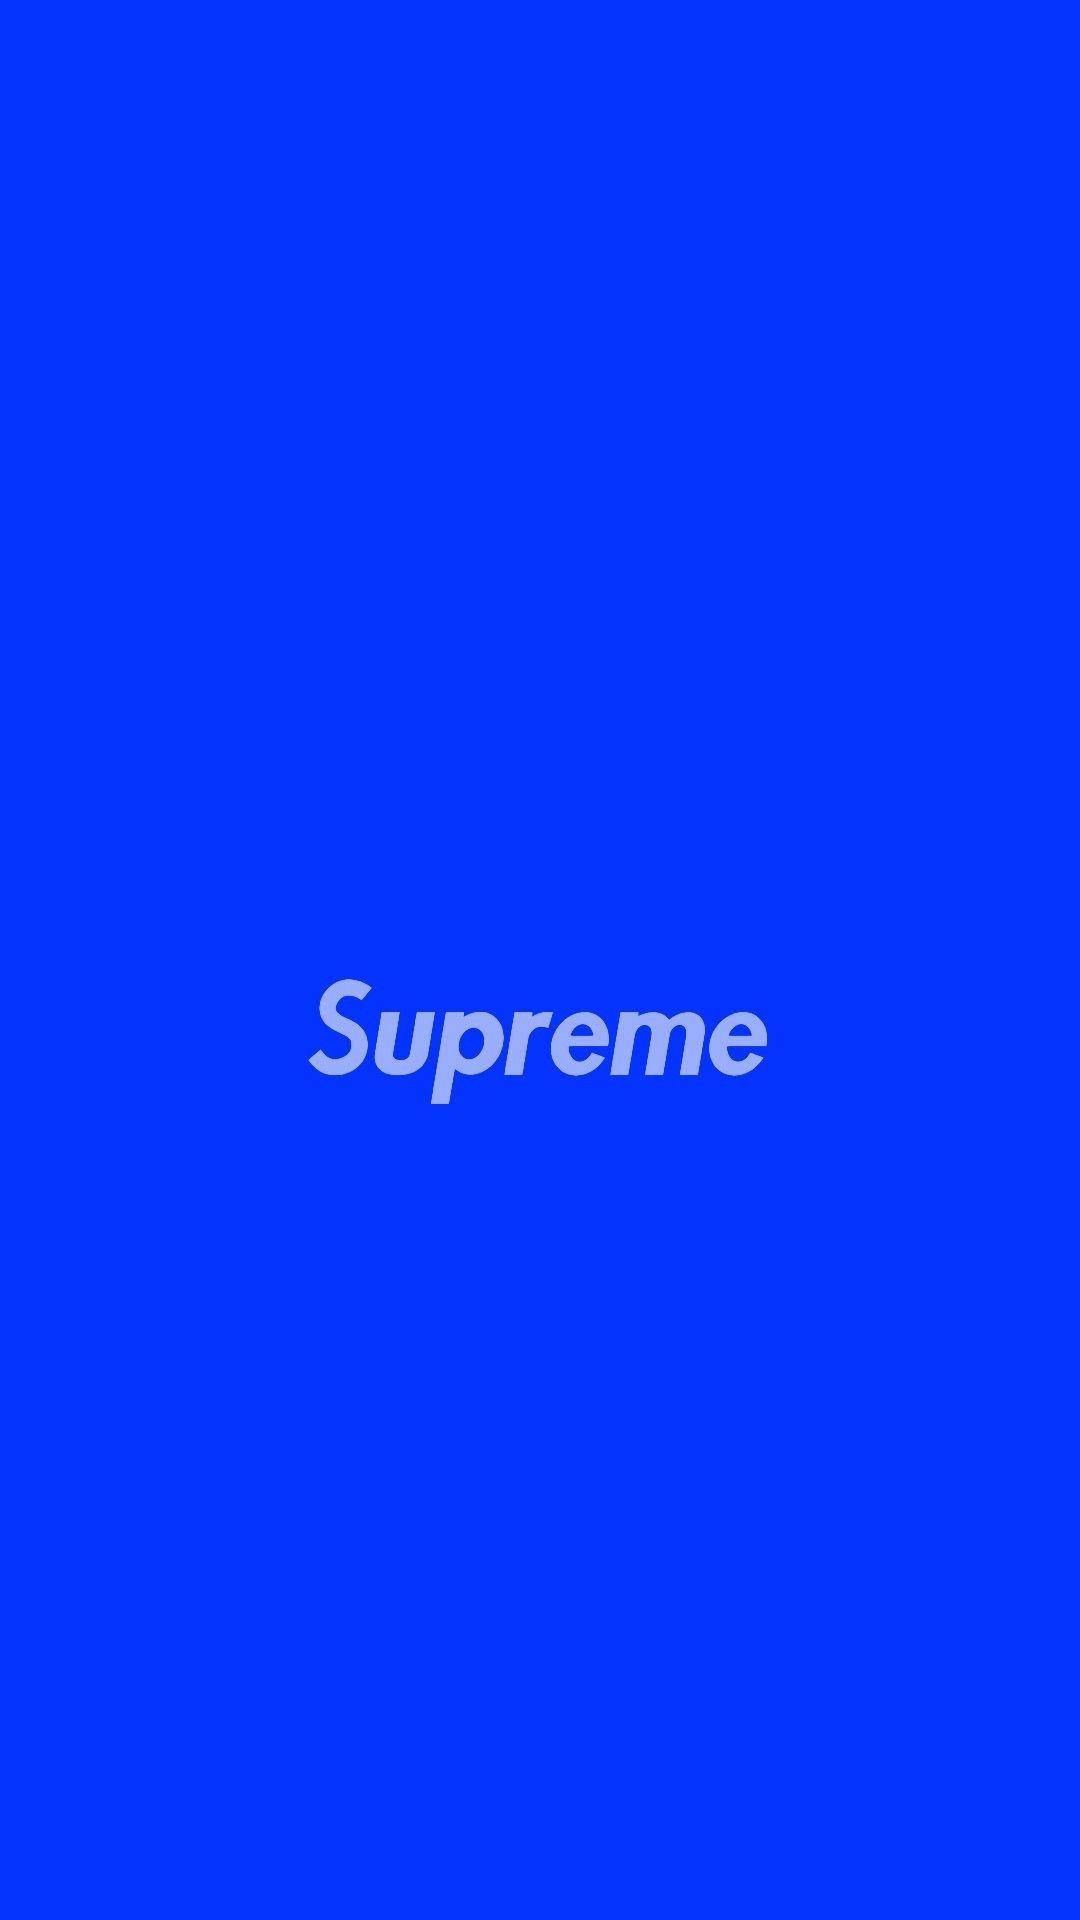 Pin By Ashton Latimer On Hypebeast Supreme Wallpaper Iphone Wallpaper Blue And White Wallpaper